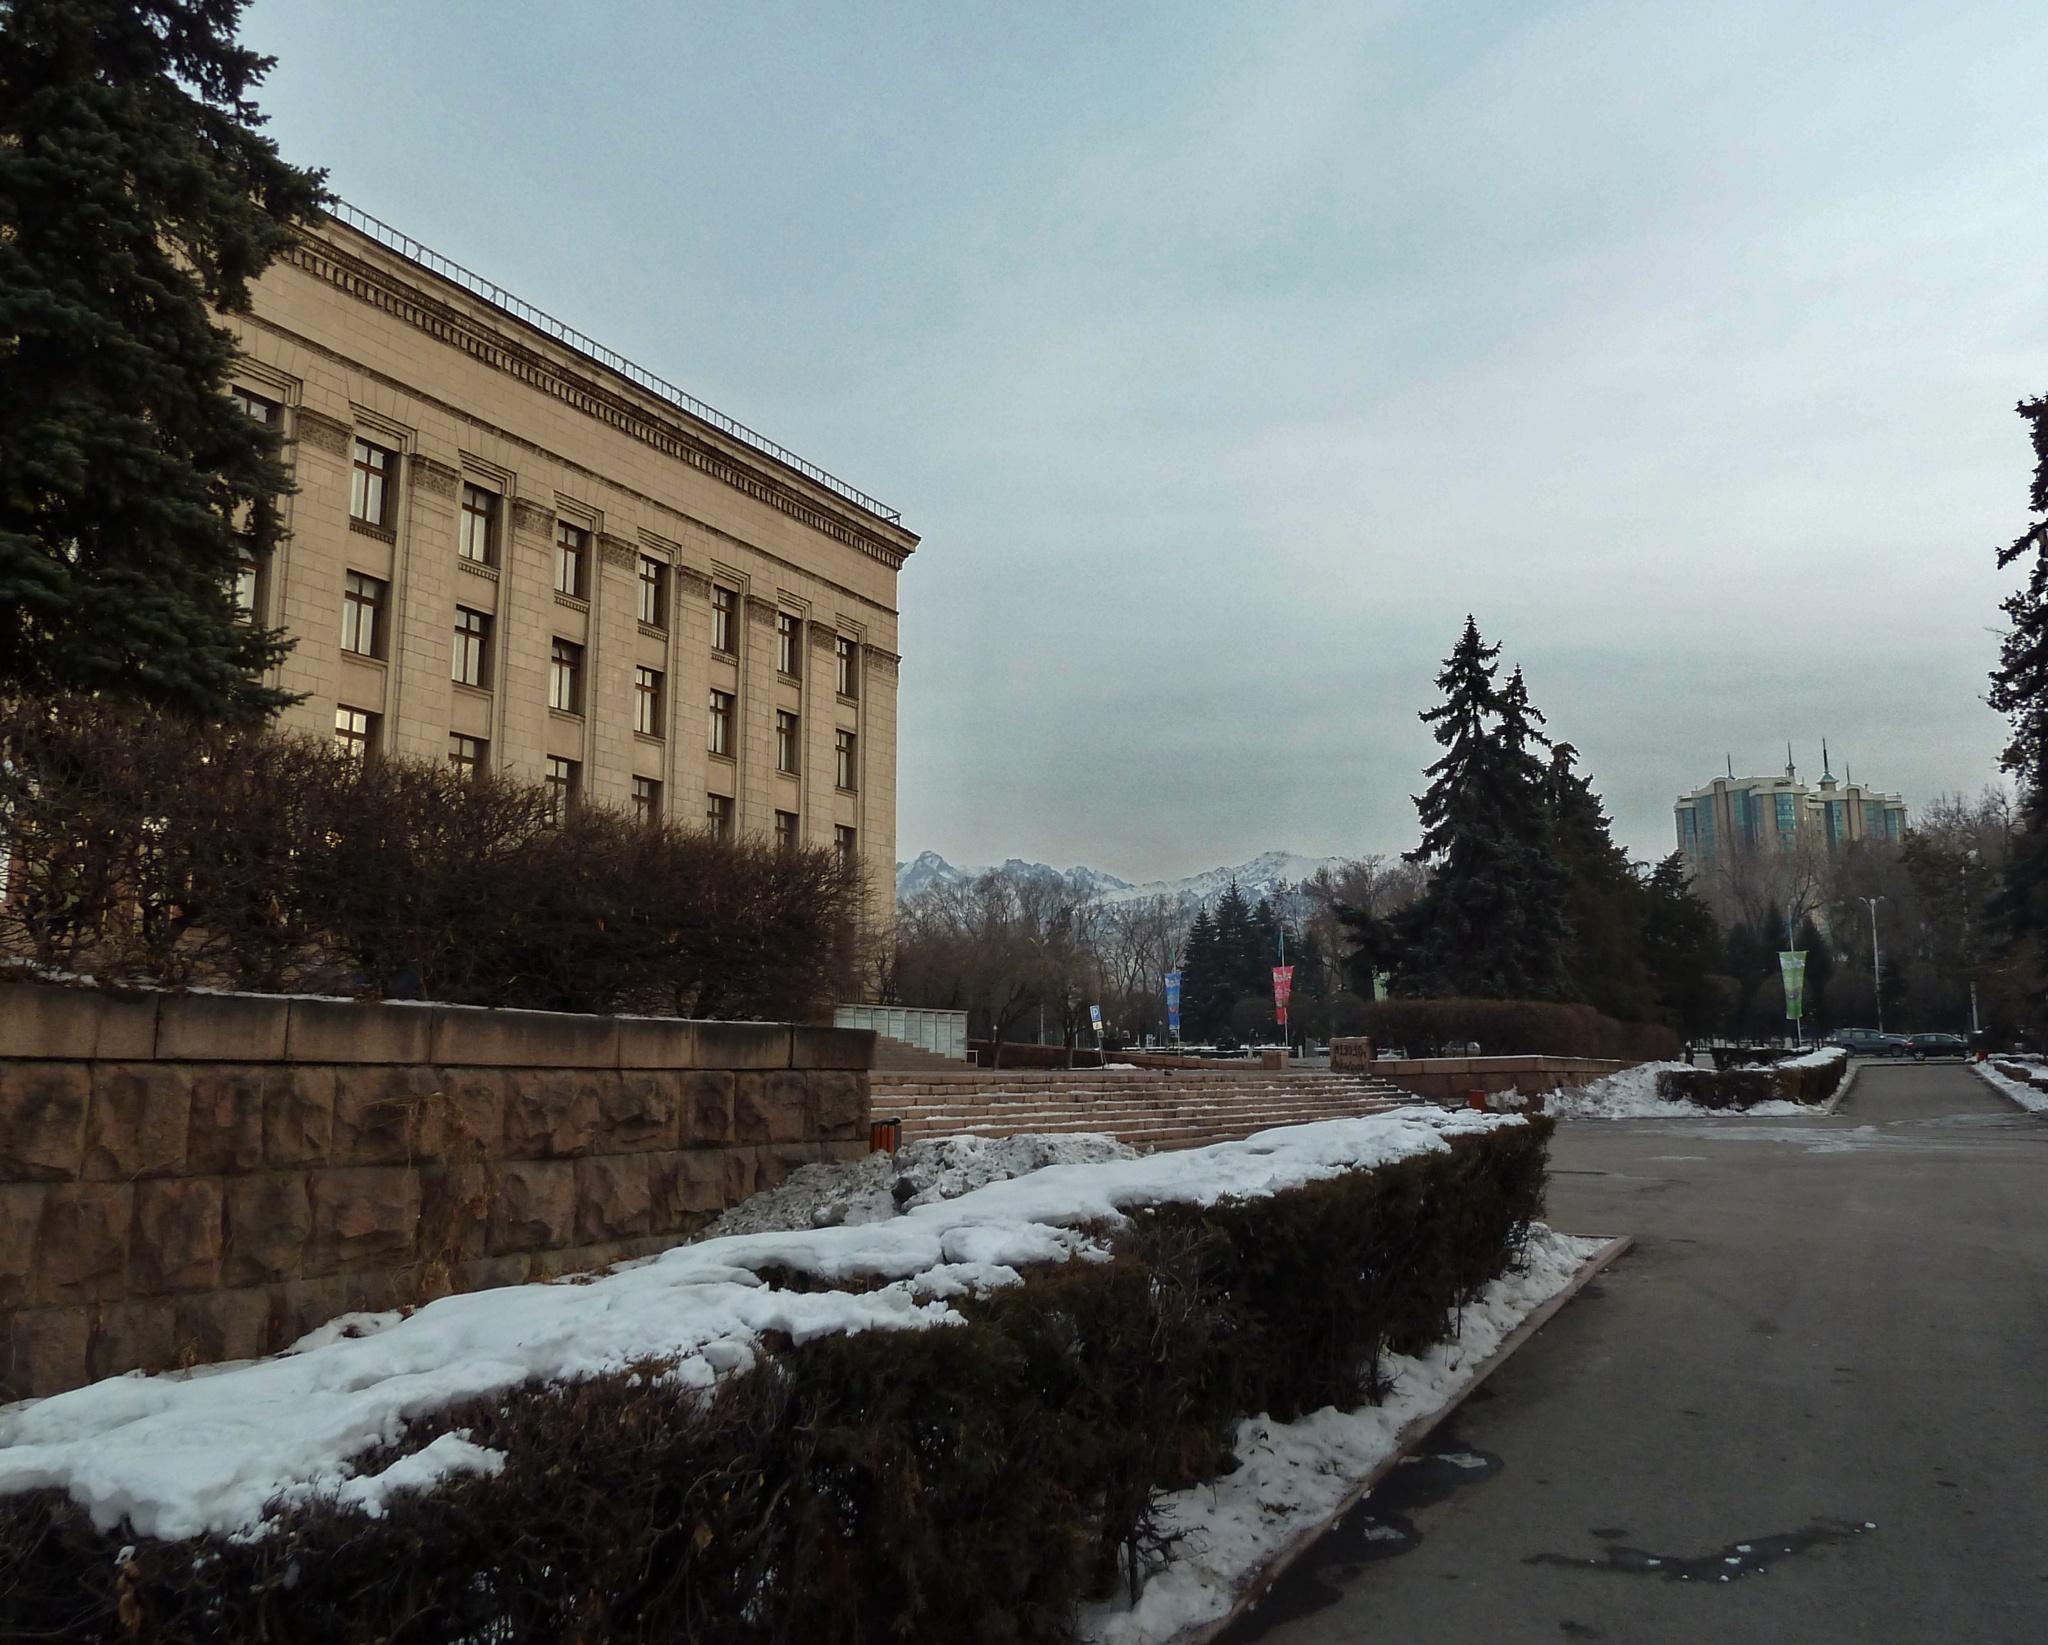 Алматы. by Murat Bukaev